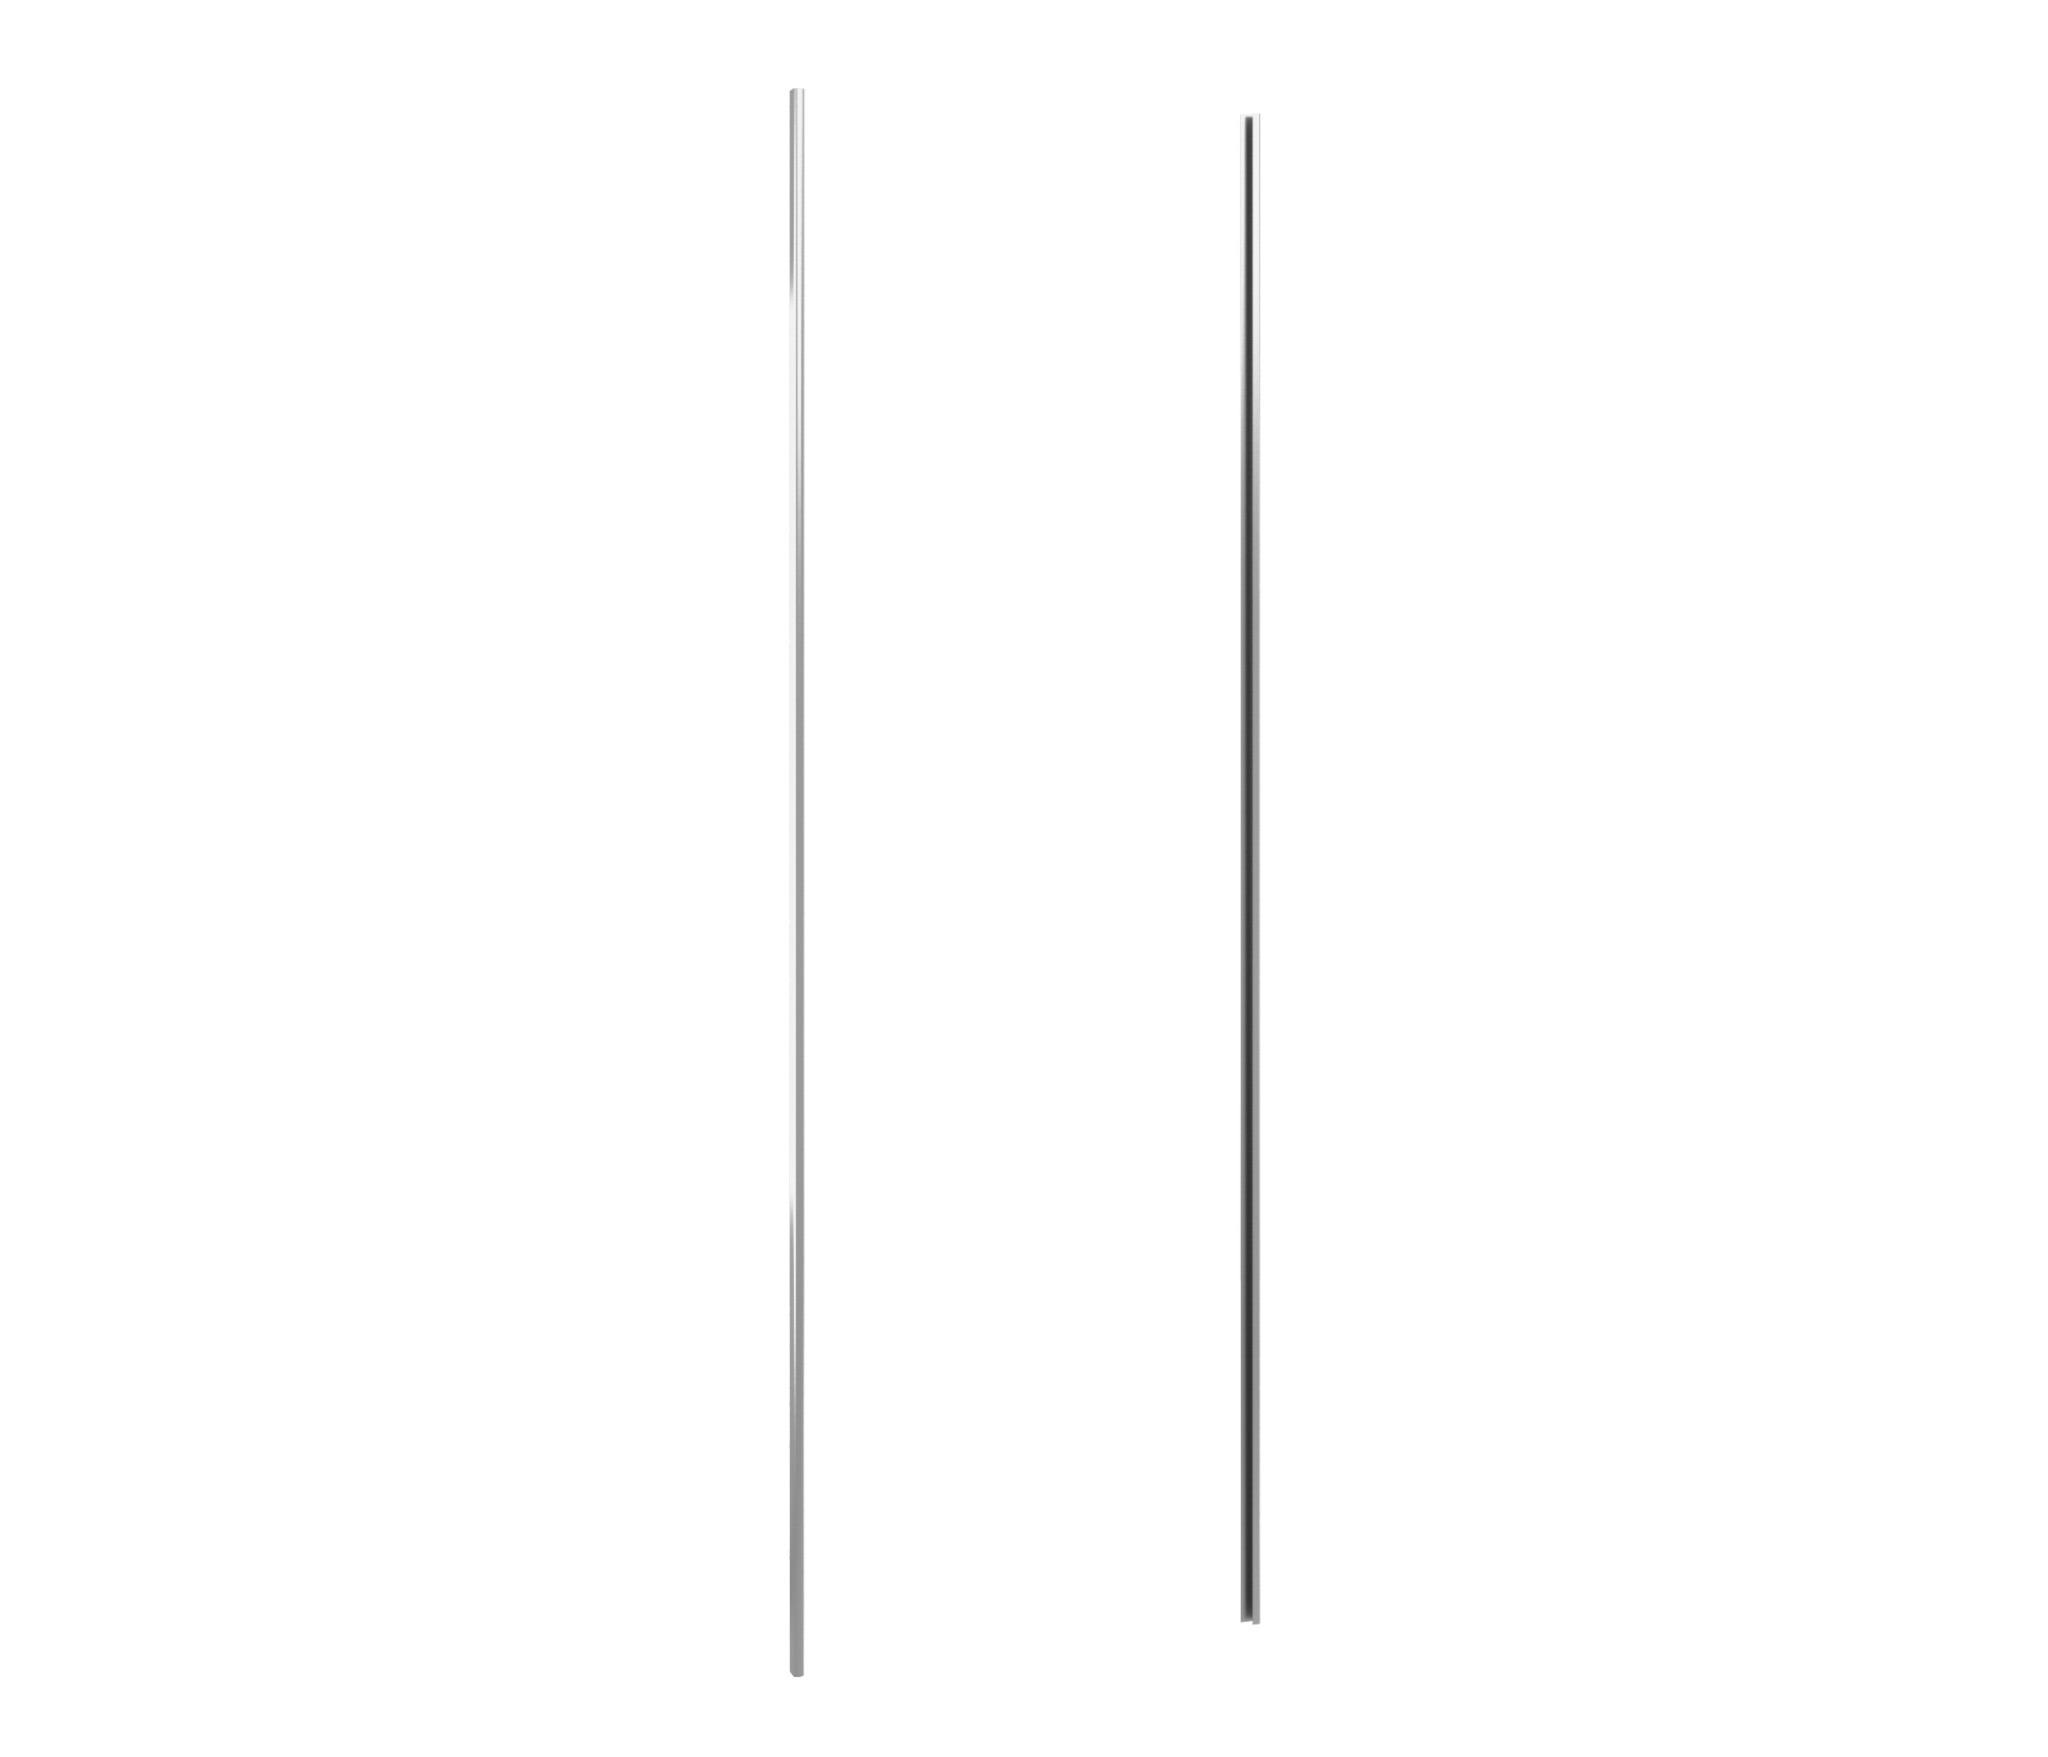 Палермо Комплект профилей для шкафа-купе 1350